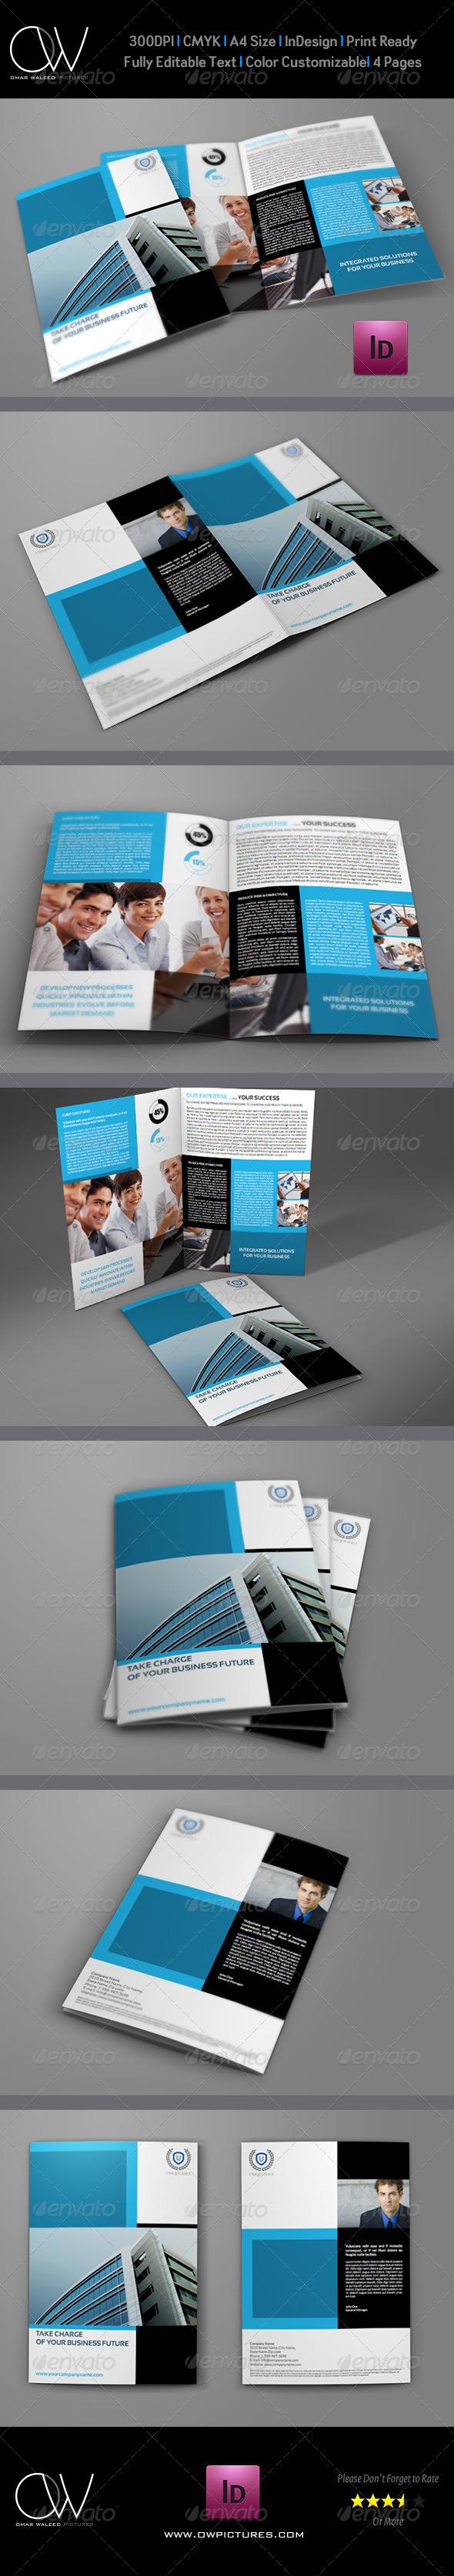 Company Brochure Bi-Fold Template Vol.9 - Corporate Brochures